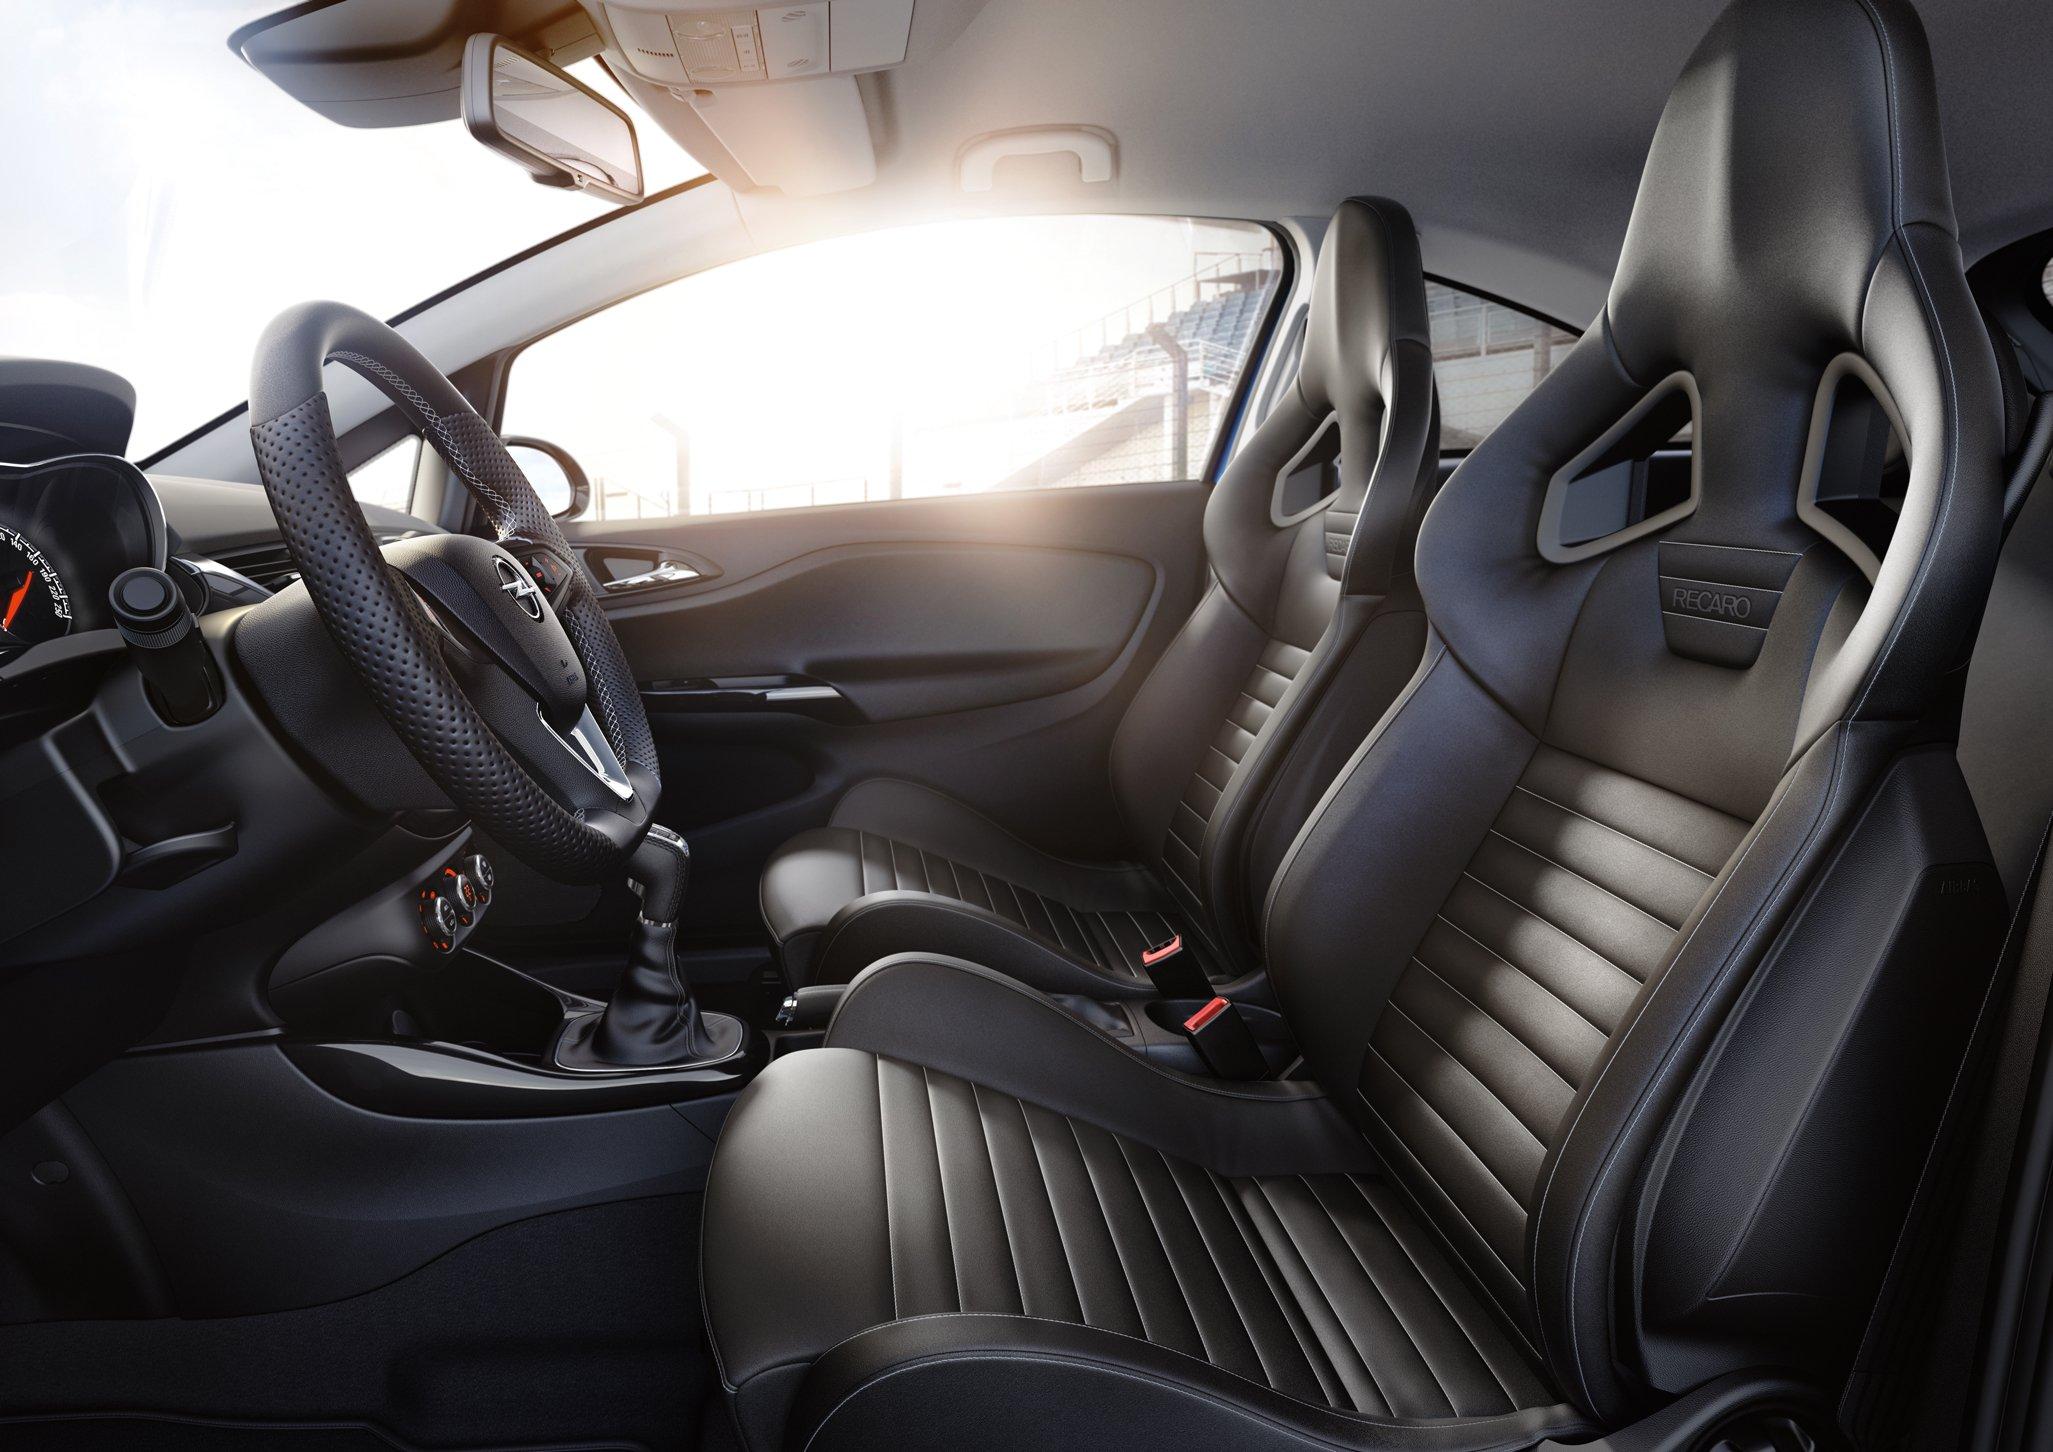 Opel-Corsa-OPC-Interior-292990 – OneMoreLap.com